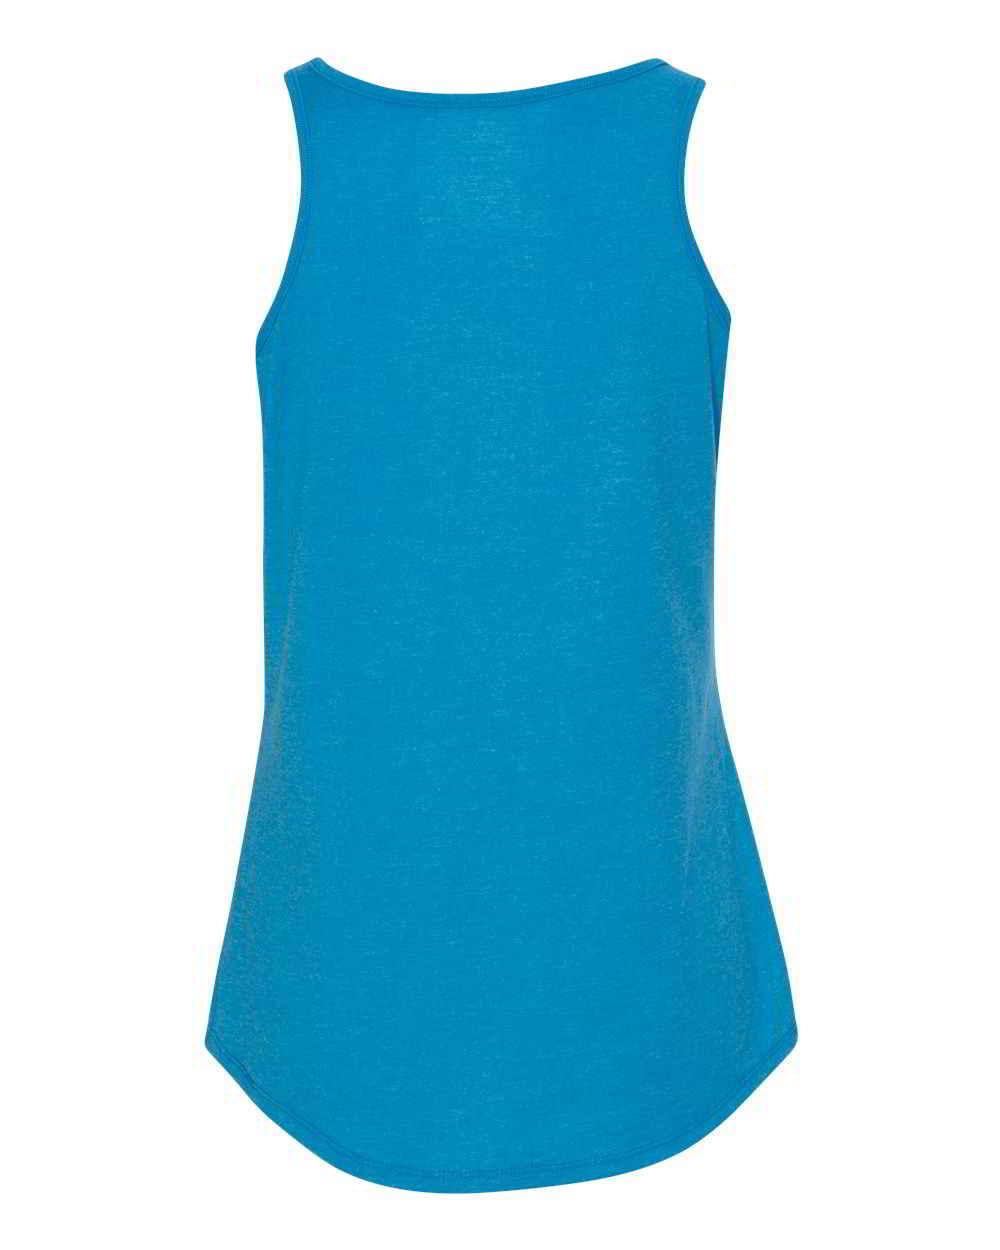 Hanes-Ladies-Moisture-Wicking-Shirts-Sleeveless-X-Temp-Women-039-s-Tank-Top thumbnail 18